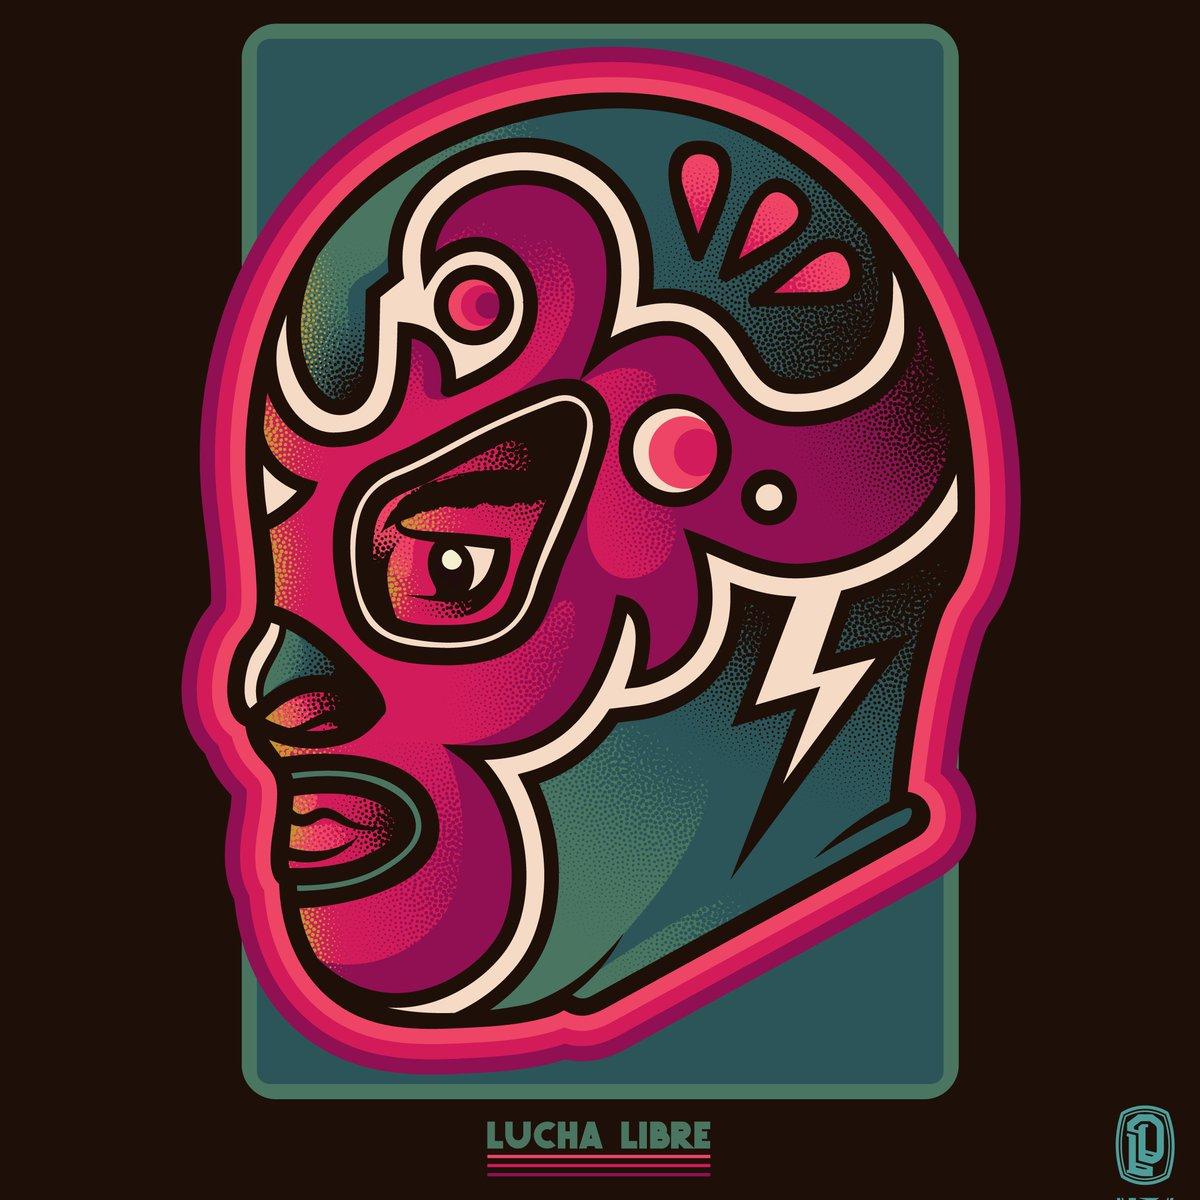 Lucha II #illustration #illustrator #design #art #arte #print #luchador #luchalibre #mascara #mask #society6 #artprint #surreal